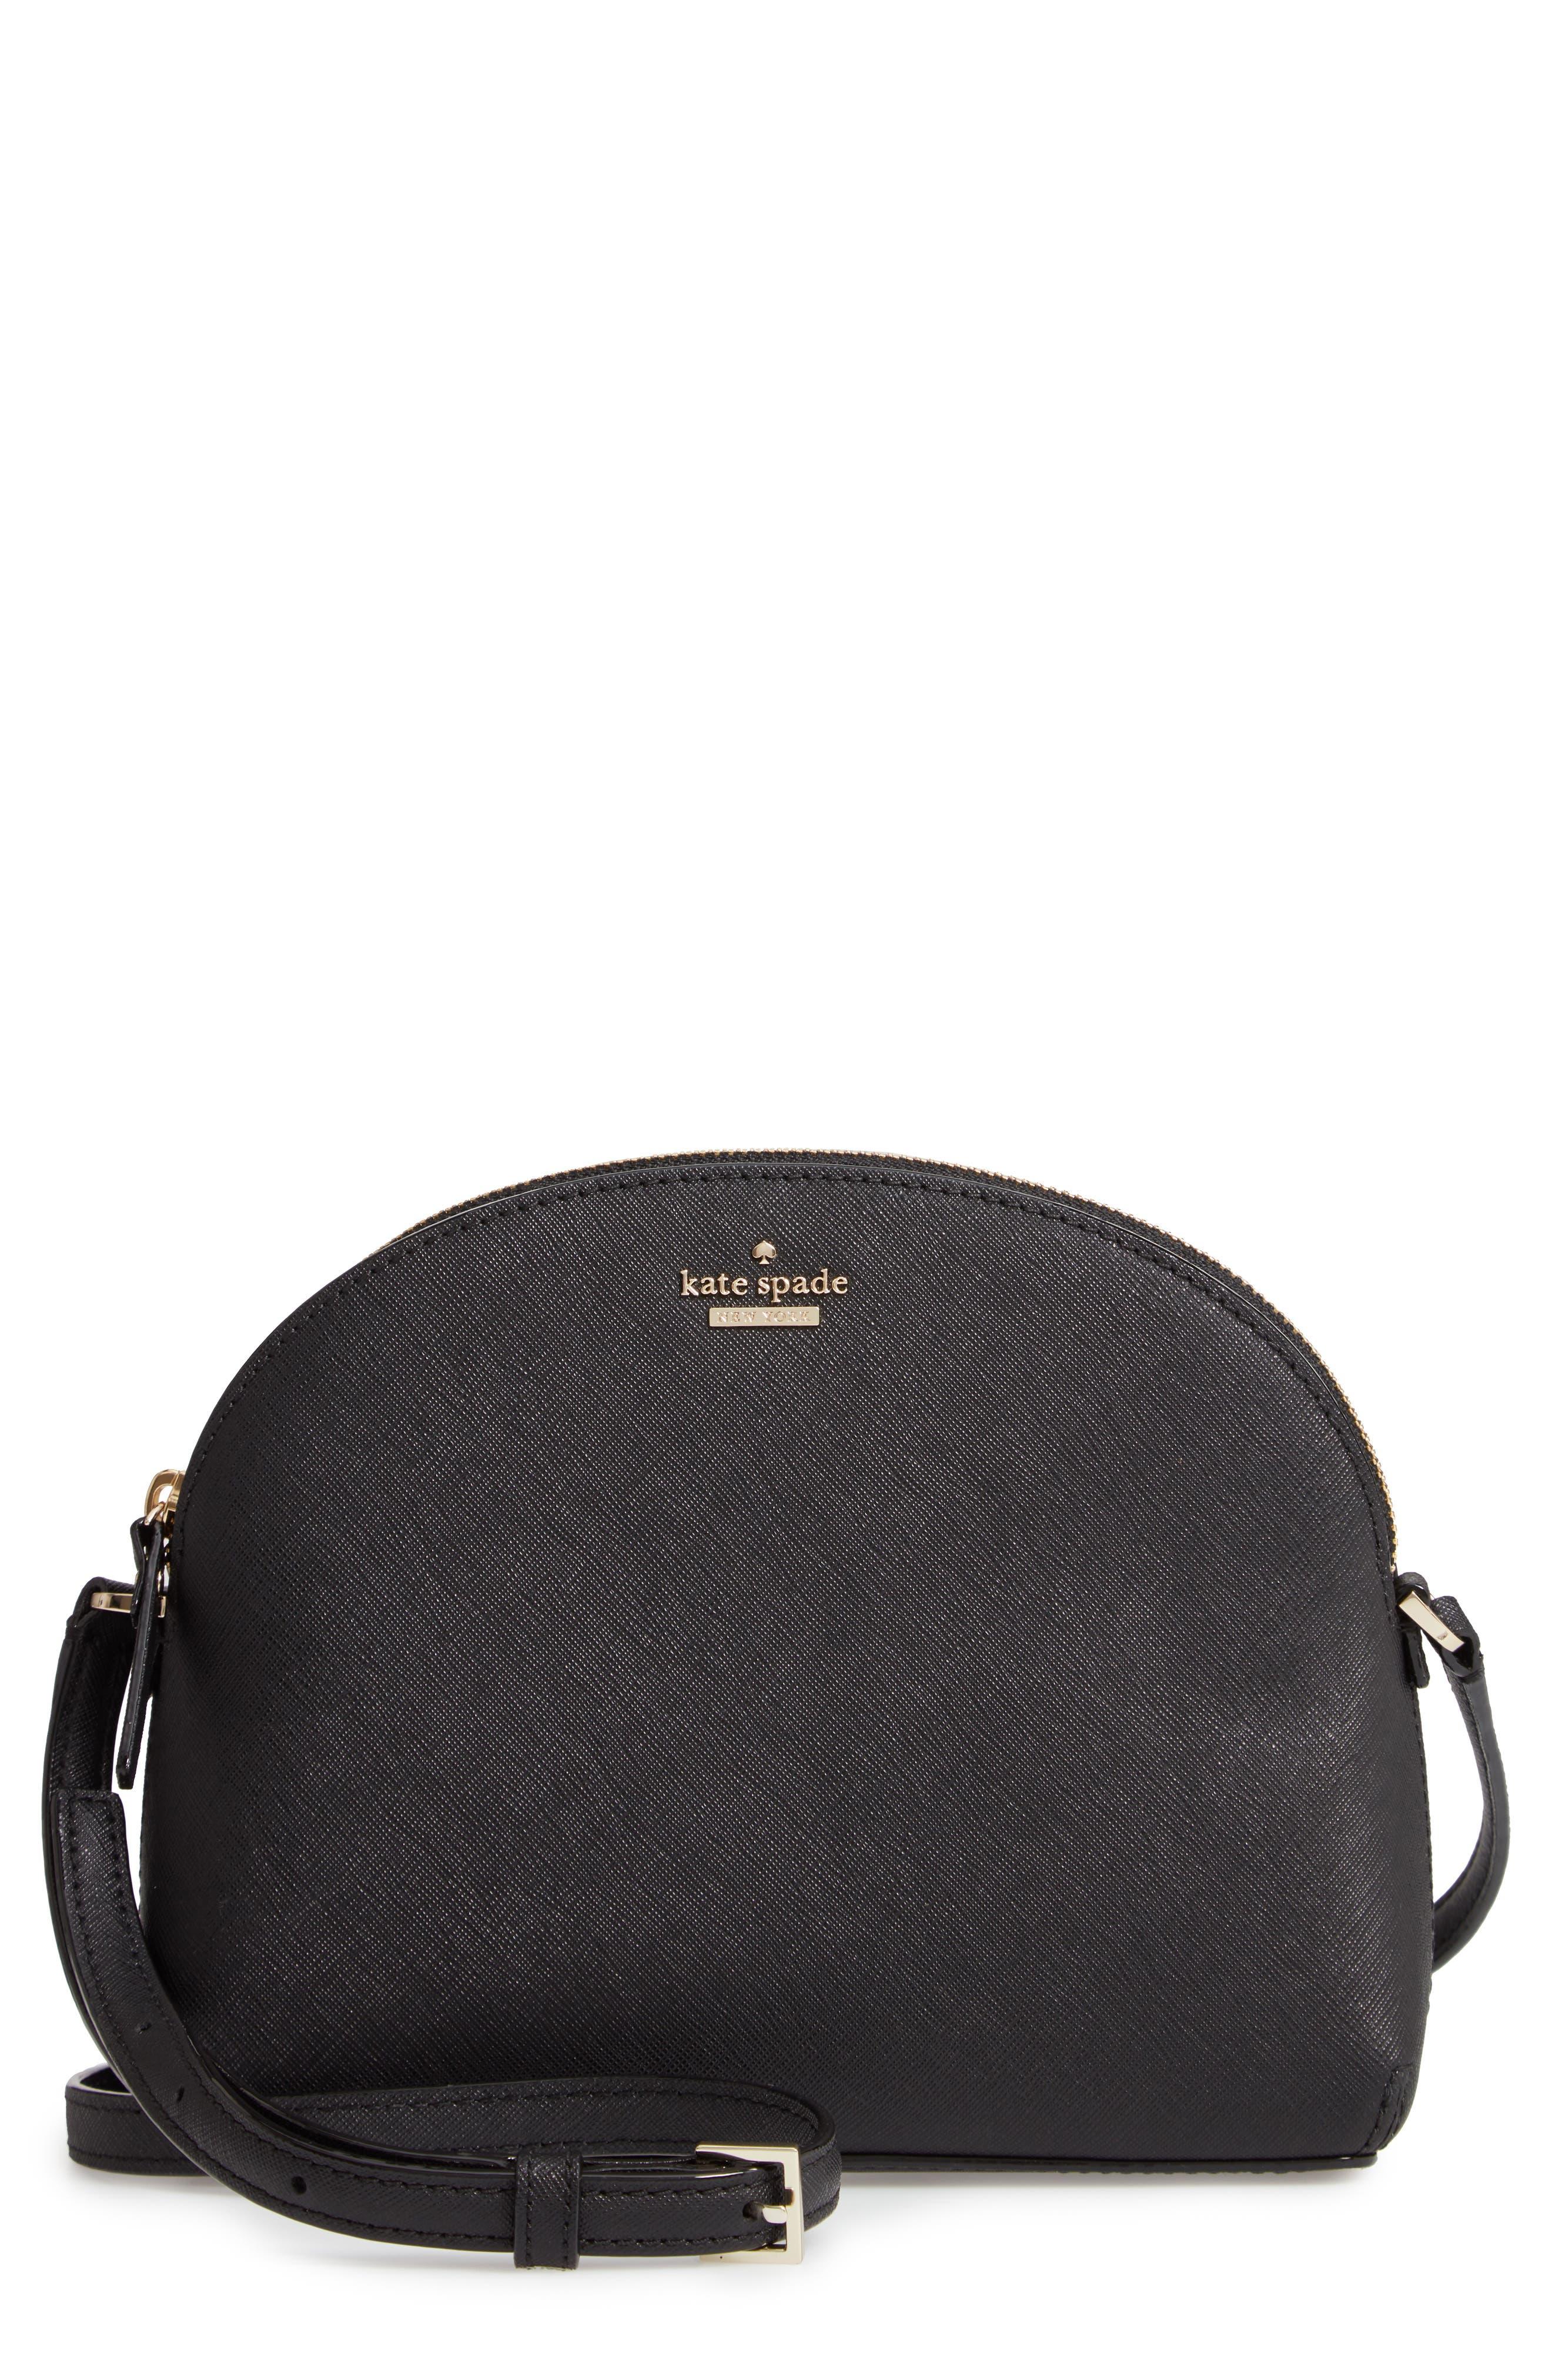 KATE SPADE NEW YORK, cameron street large hilli leather crossbody bag, Main thumbnail 1, color, 001